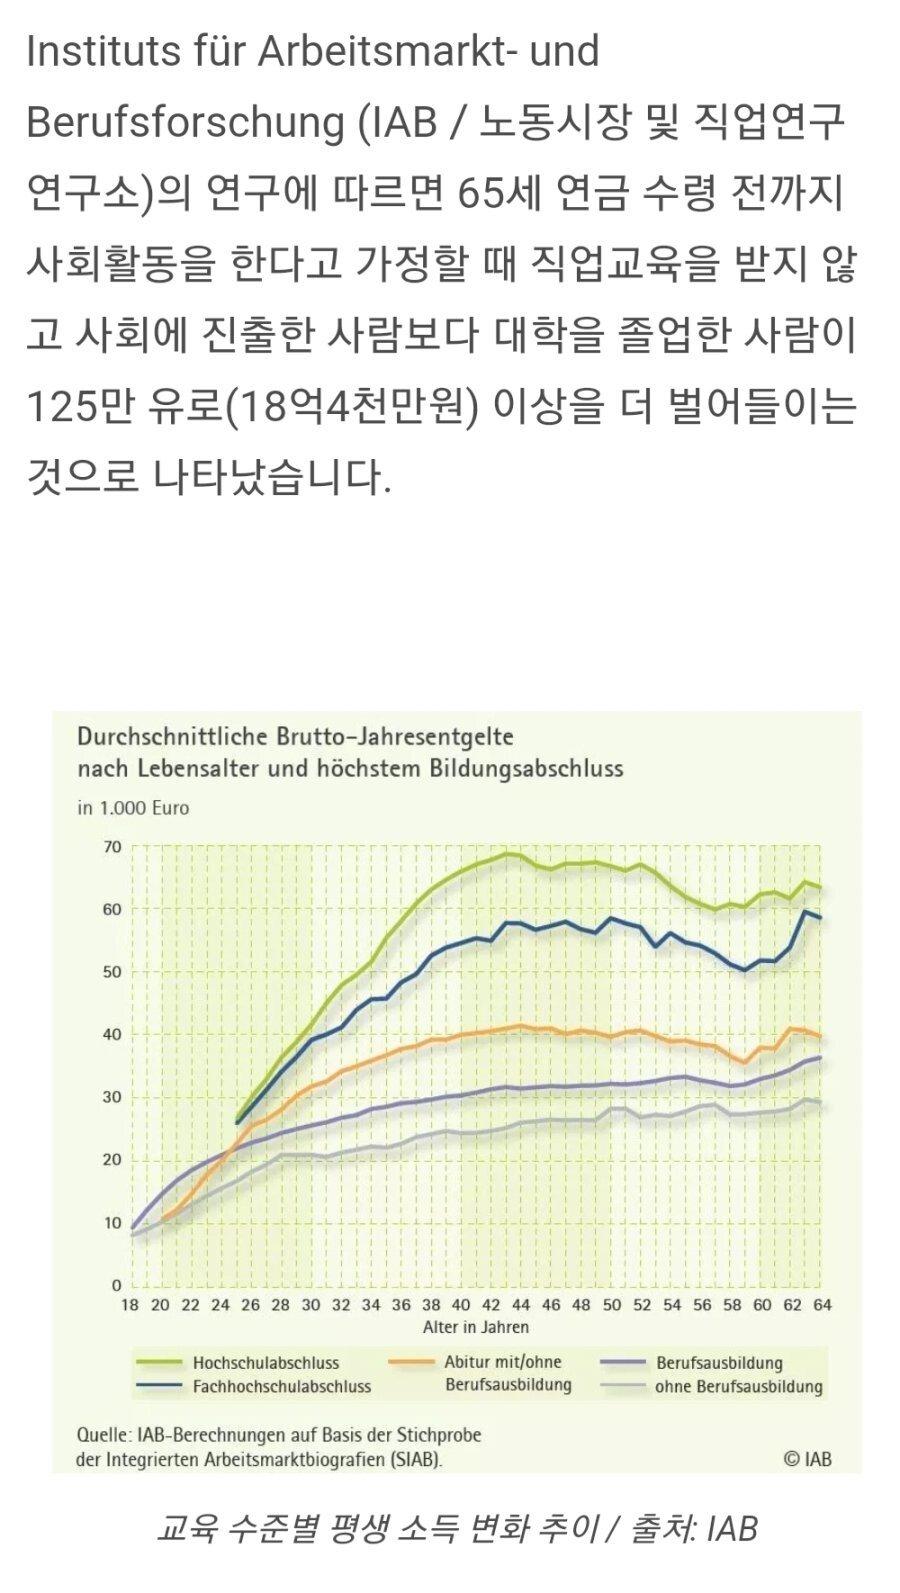 16869a3d5464b5f7a.jpg 한국에서 본 받자는 독일 교육제도의 실상